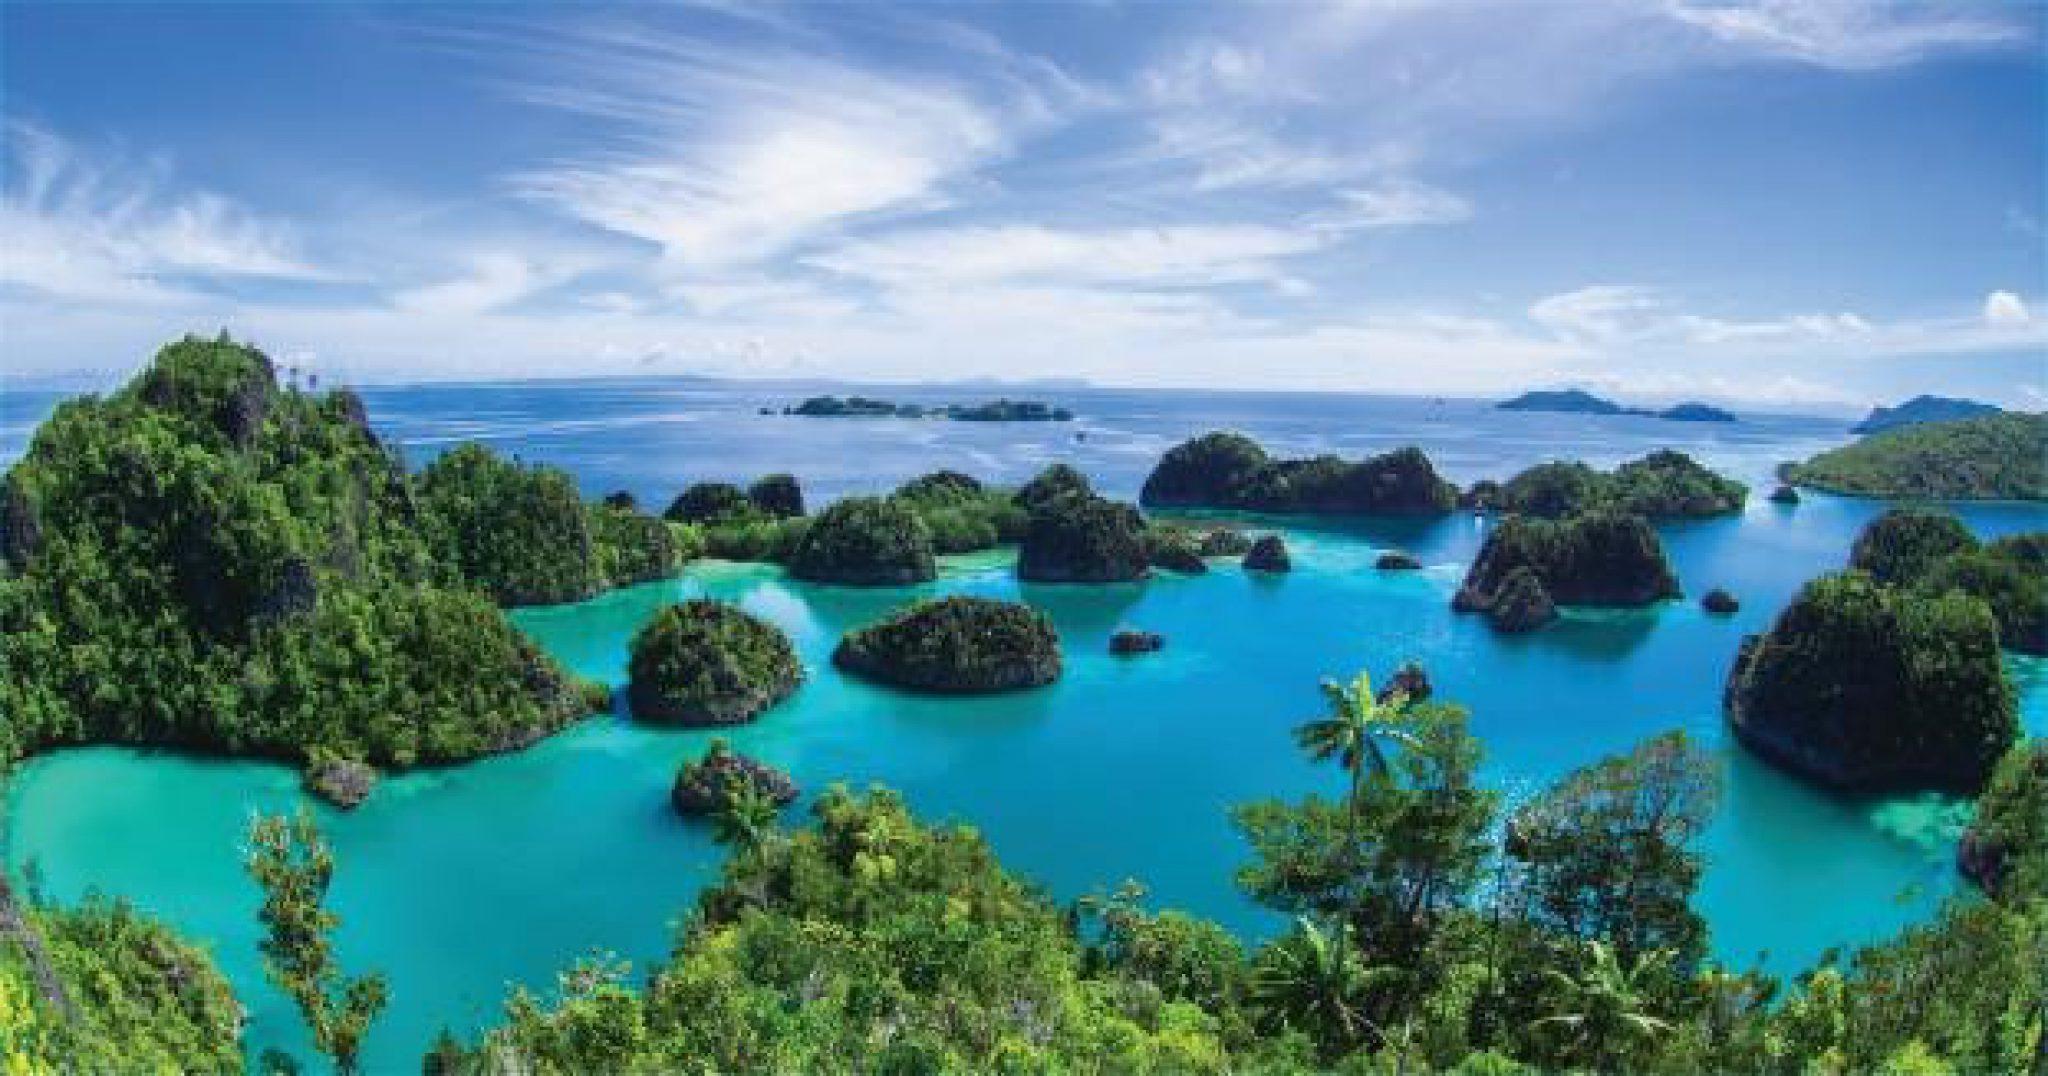 6 Alasan Wisata Raja Ampat Papua Wajib Jadi Tujuan Liburan 6